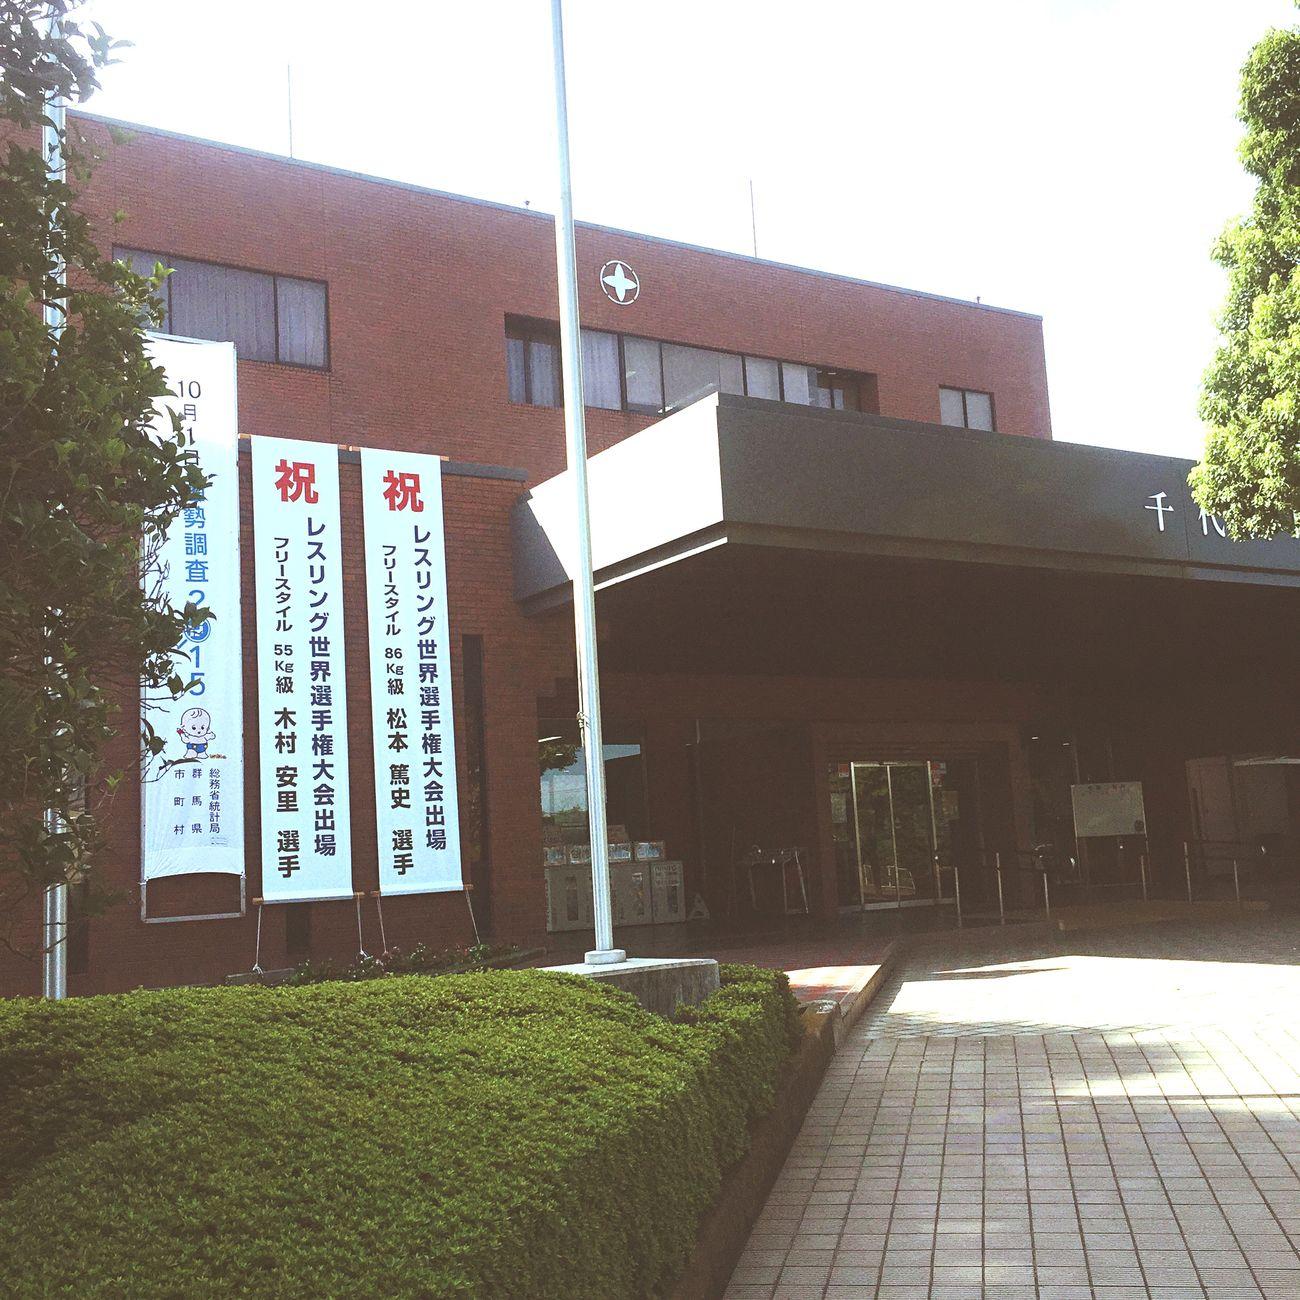 Chiyoda town hall